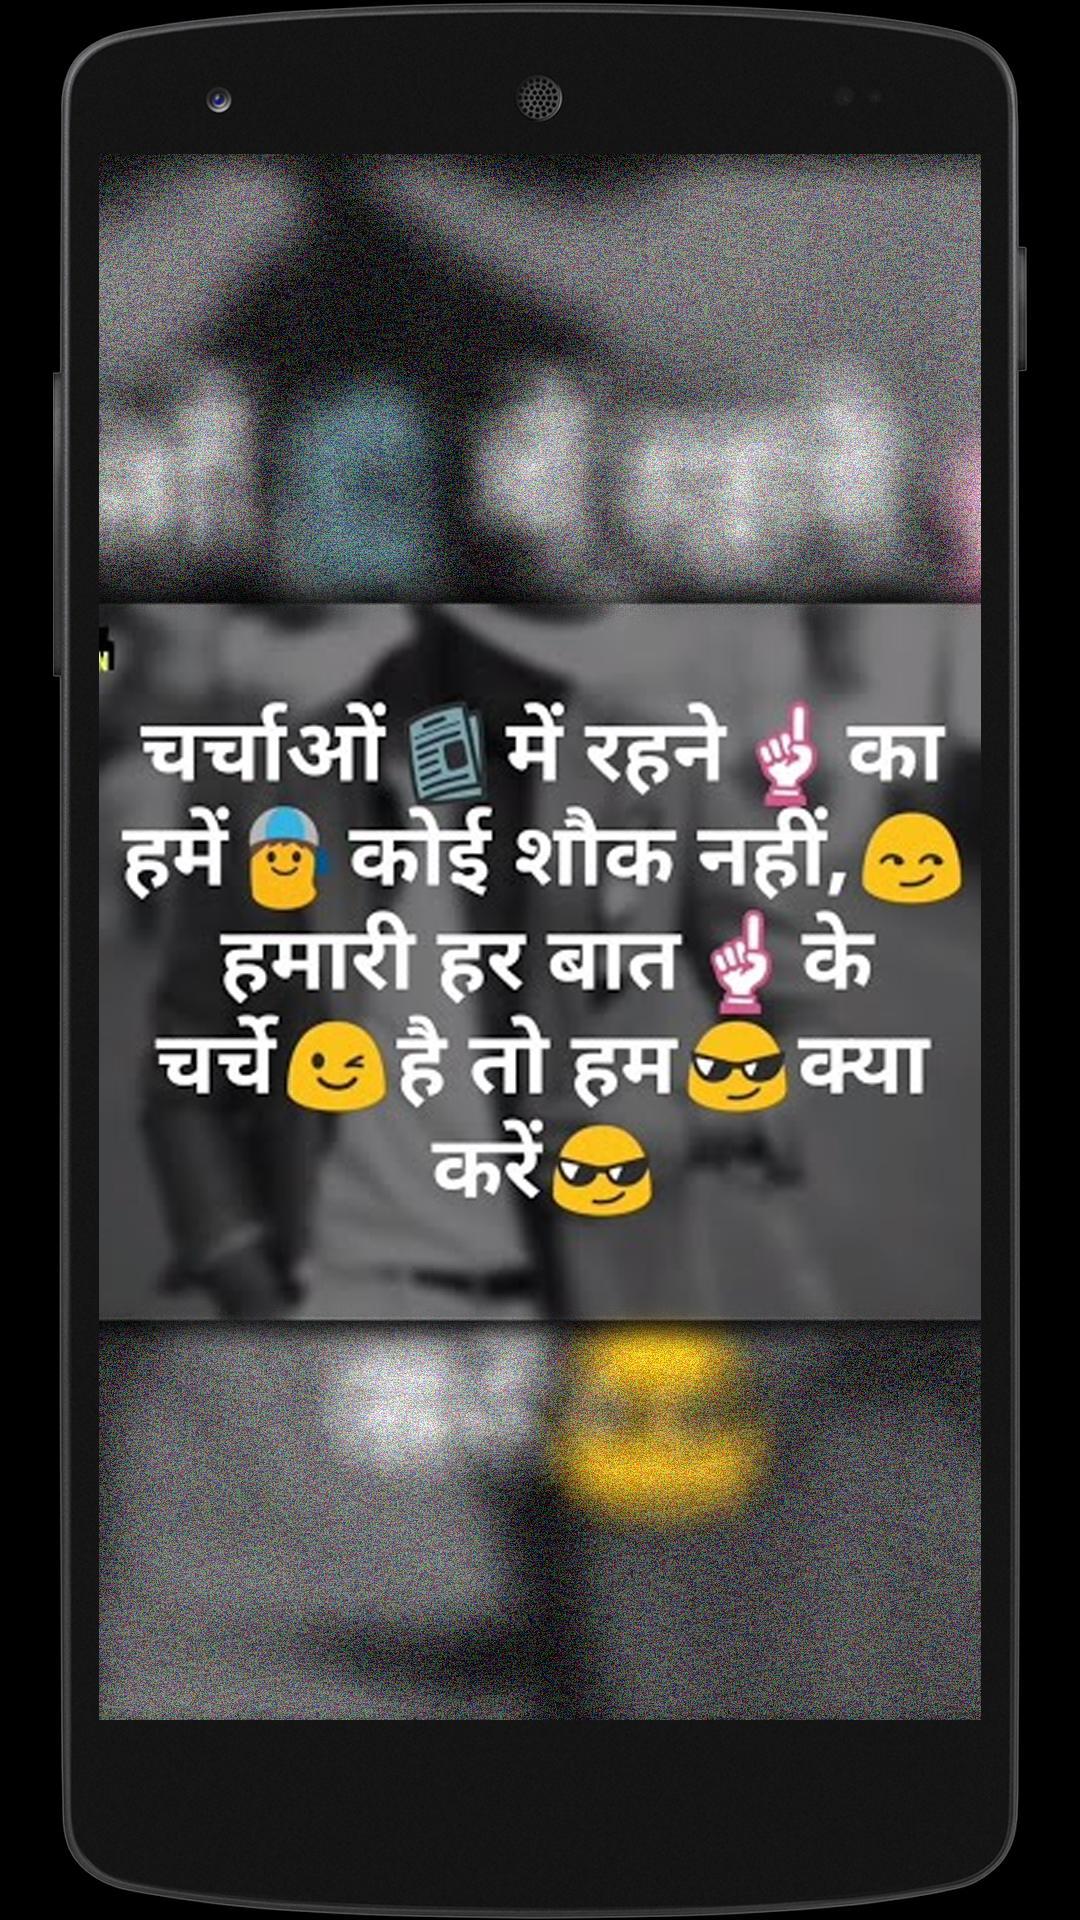 Dadagiri Status Bhaigiri दादागीरी Attitude